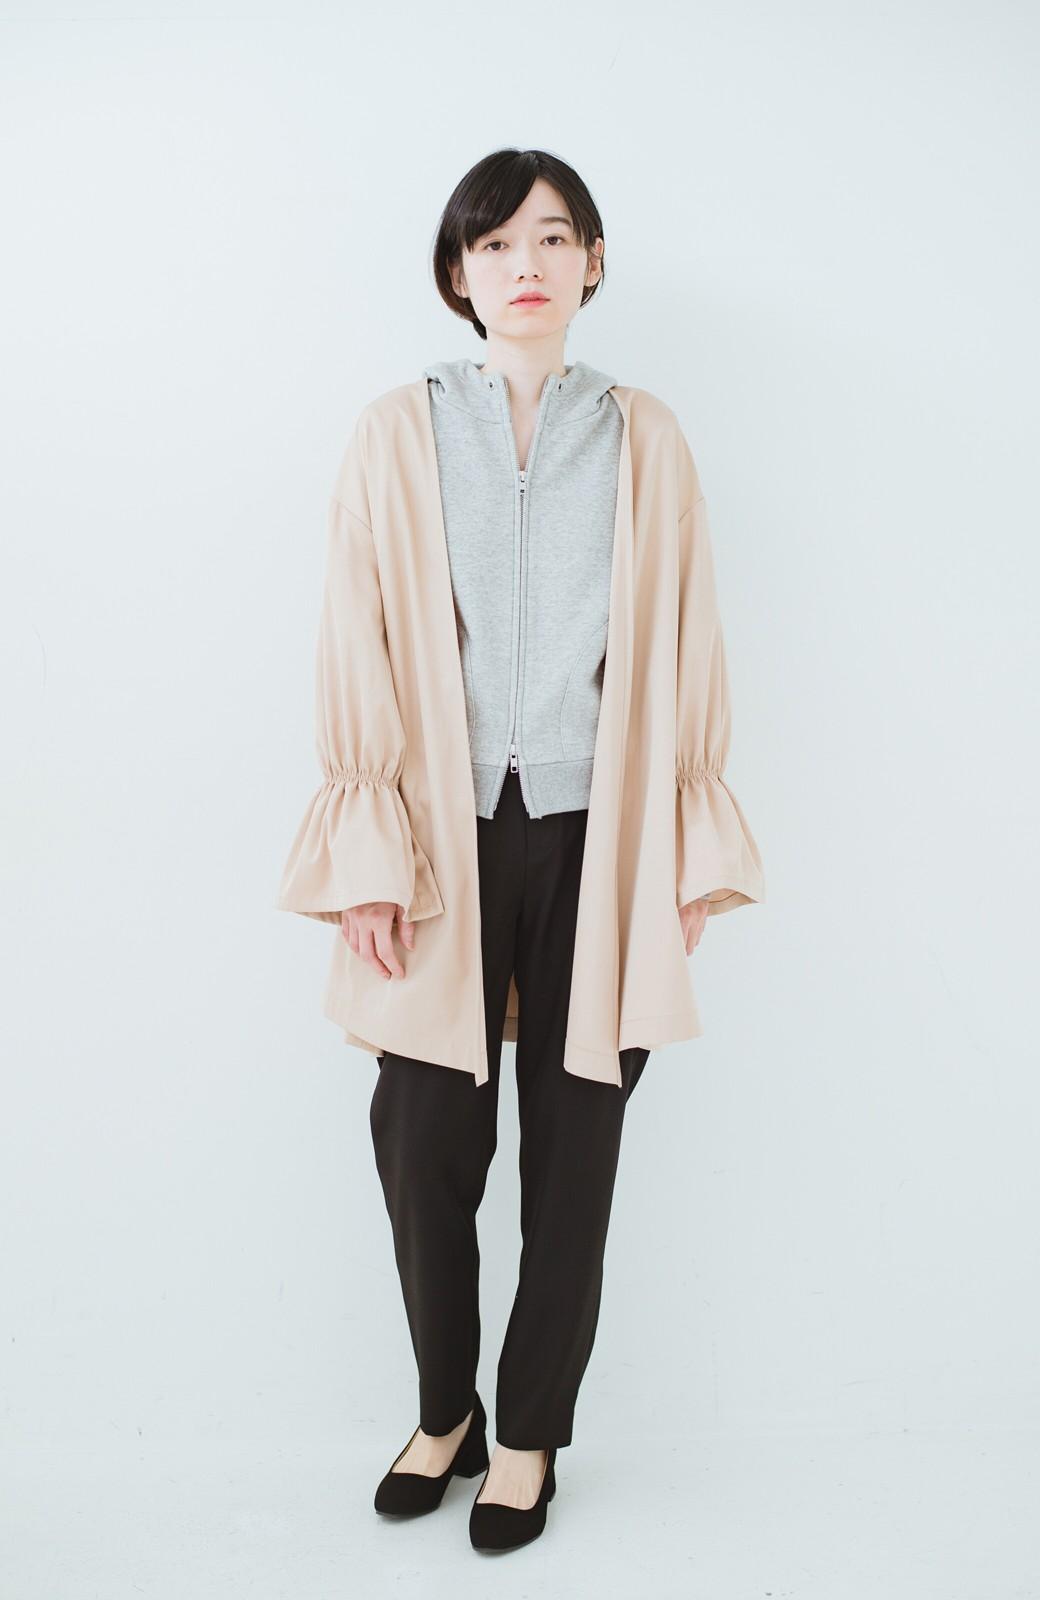 haco! ただ羽織るだけでオシャレに見える 気軽なフレアースリーブコート <ベージュ>の商品写真5